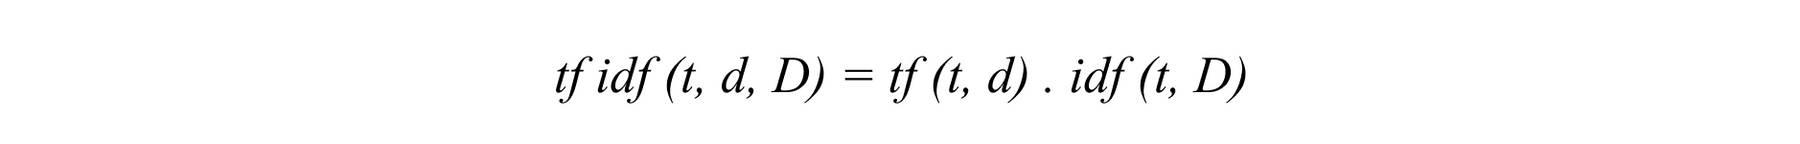 TF-IDF formula